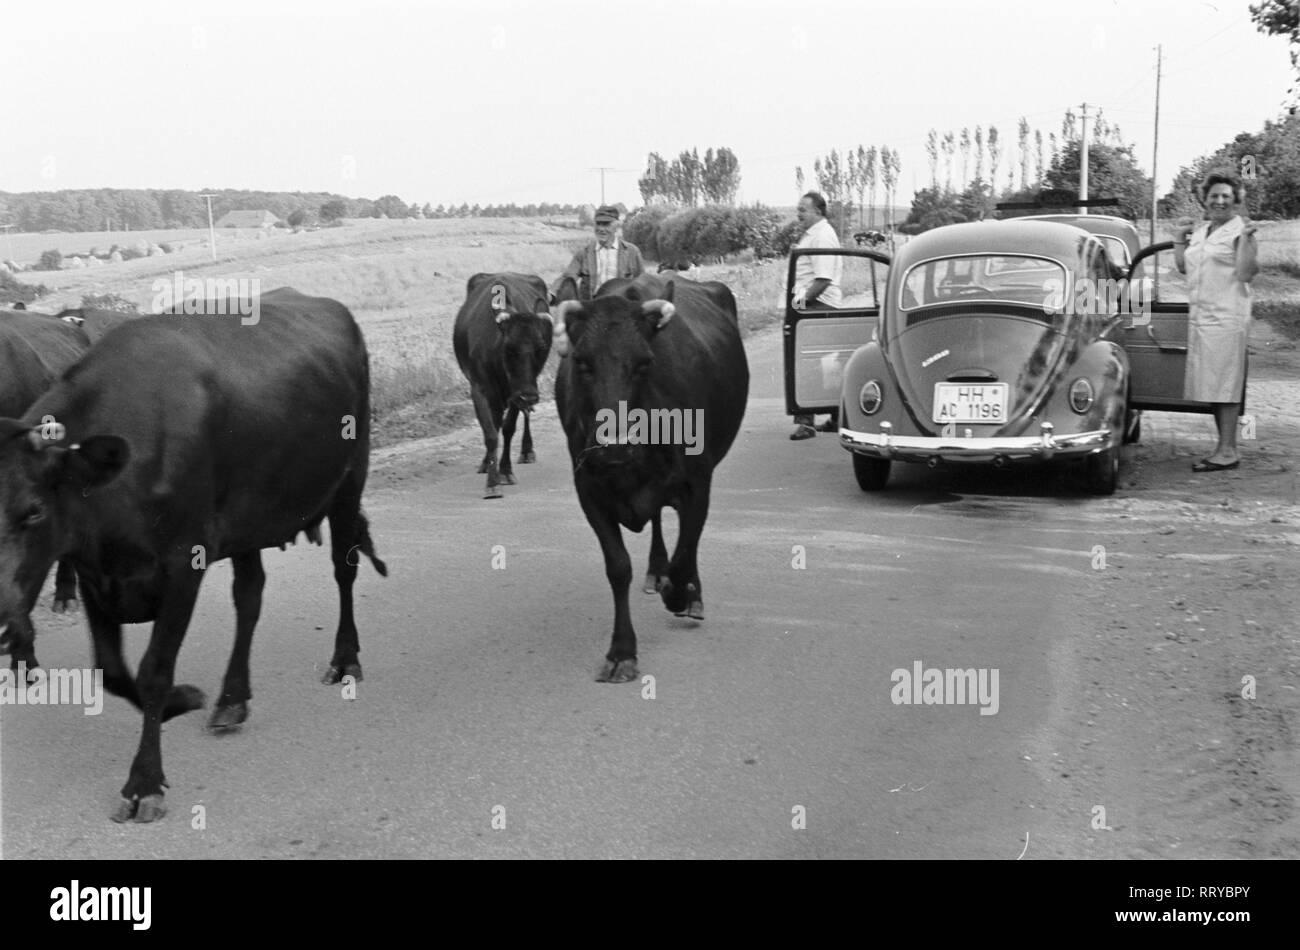 VW Beetle - VW Käfer unterwegs - Kühe auf einer Landstrasse - III - Stock Image